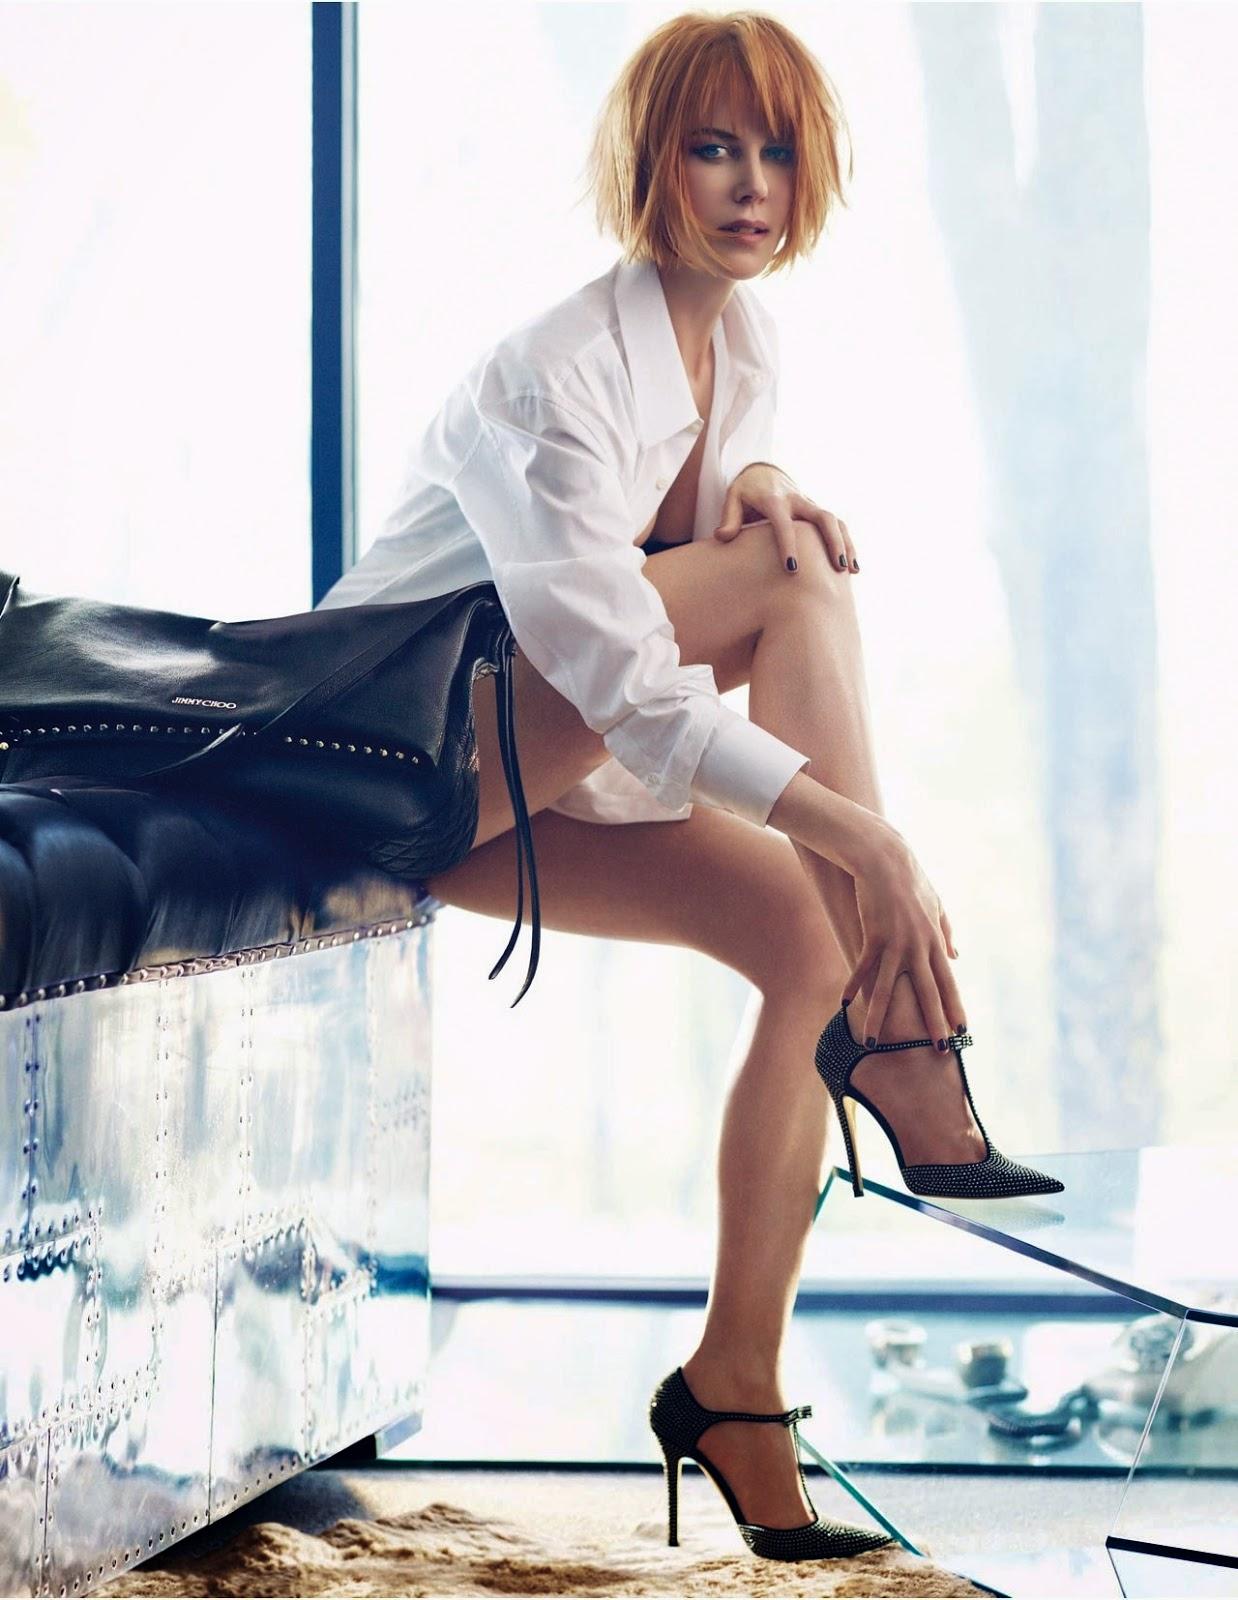 Sexy actress Nicole Kidman